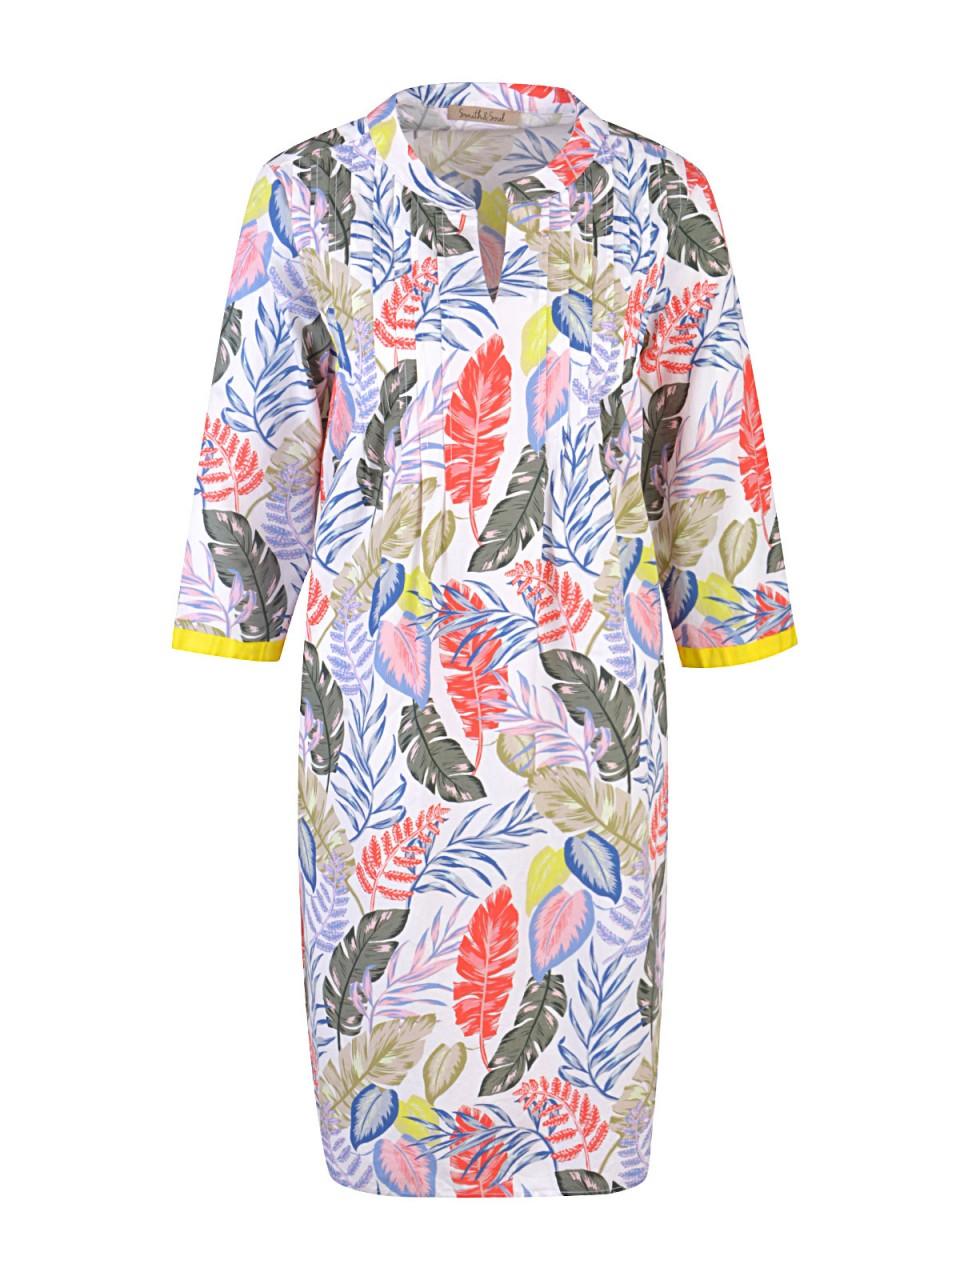 Kleider - SMITH SOUL Damen Kleid, rosa  - Onlineshop Designermode.com